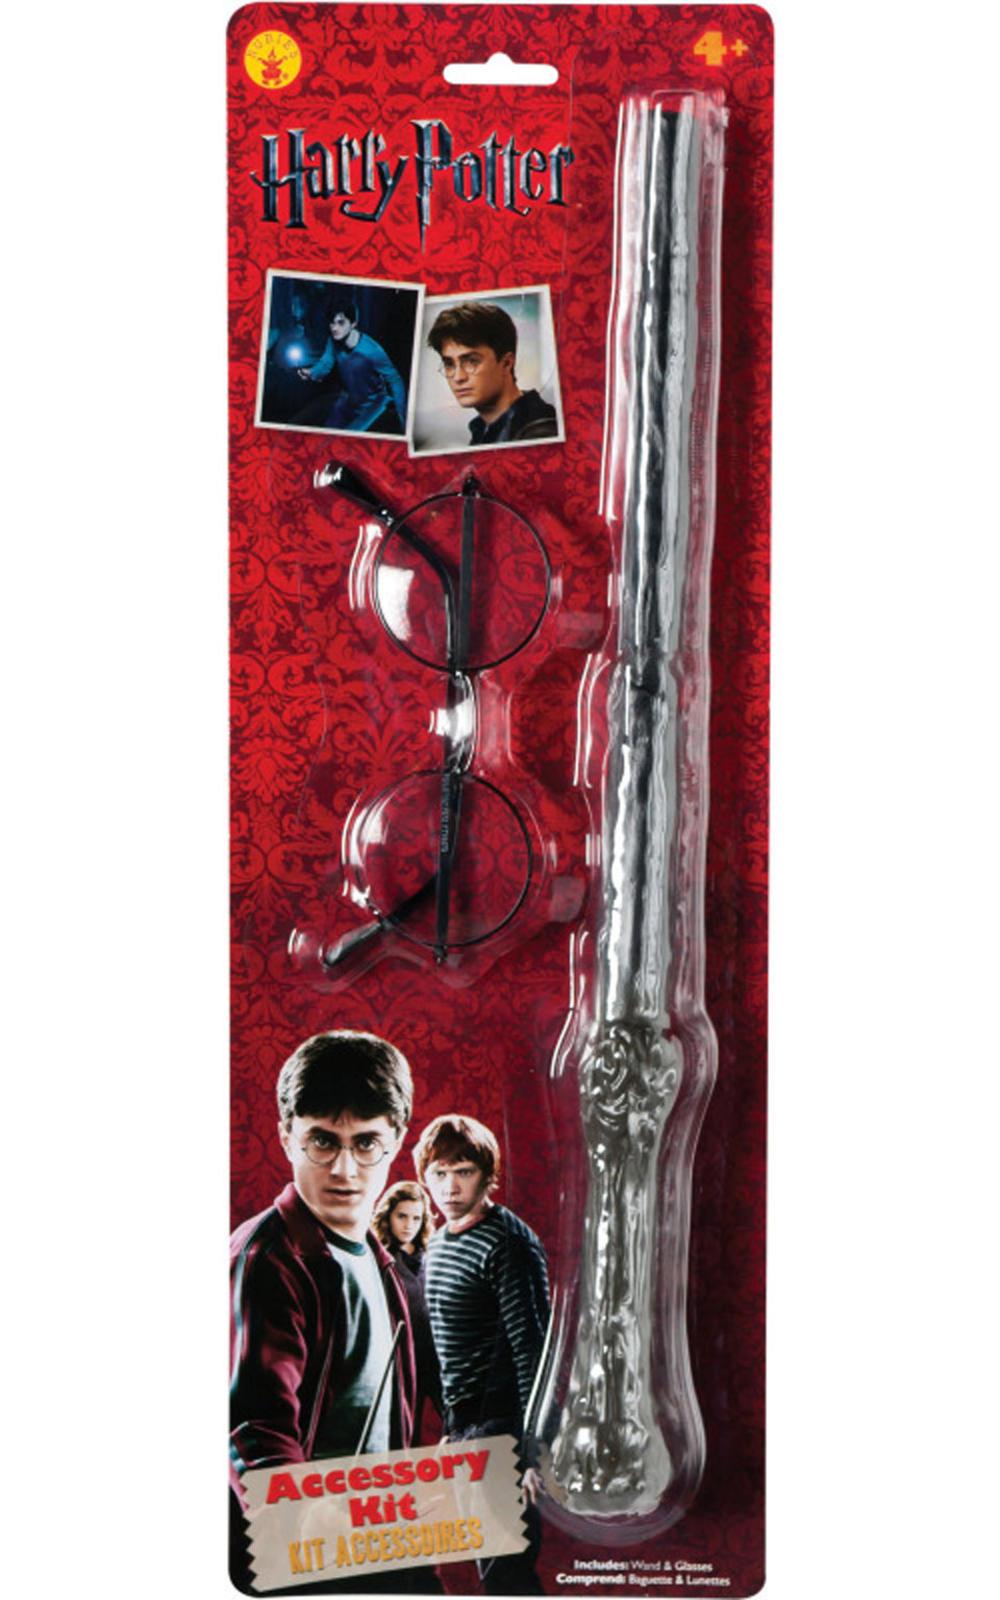 Harry Potter Glasses & Wand Kit